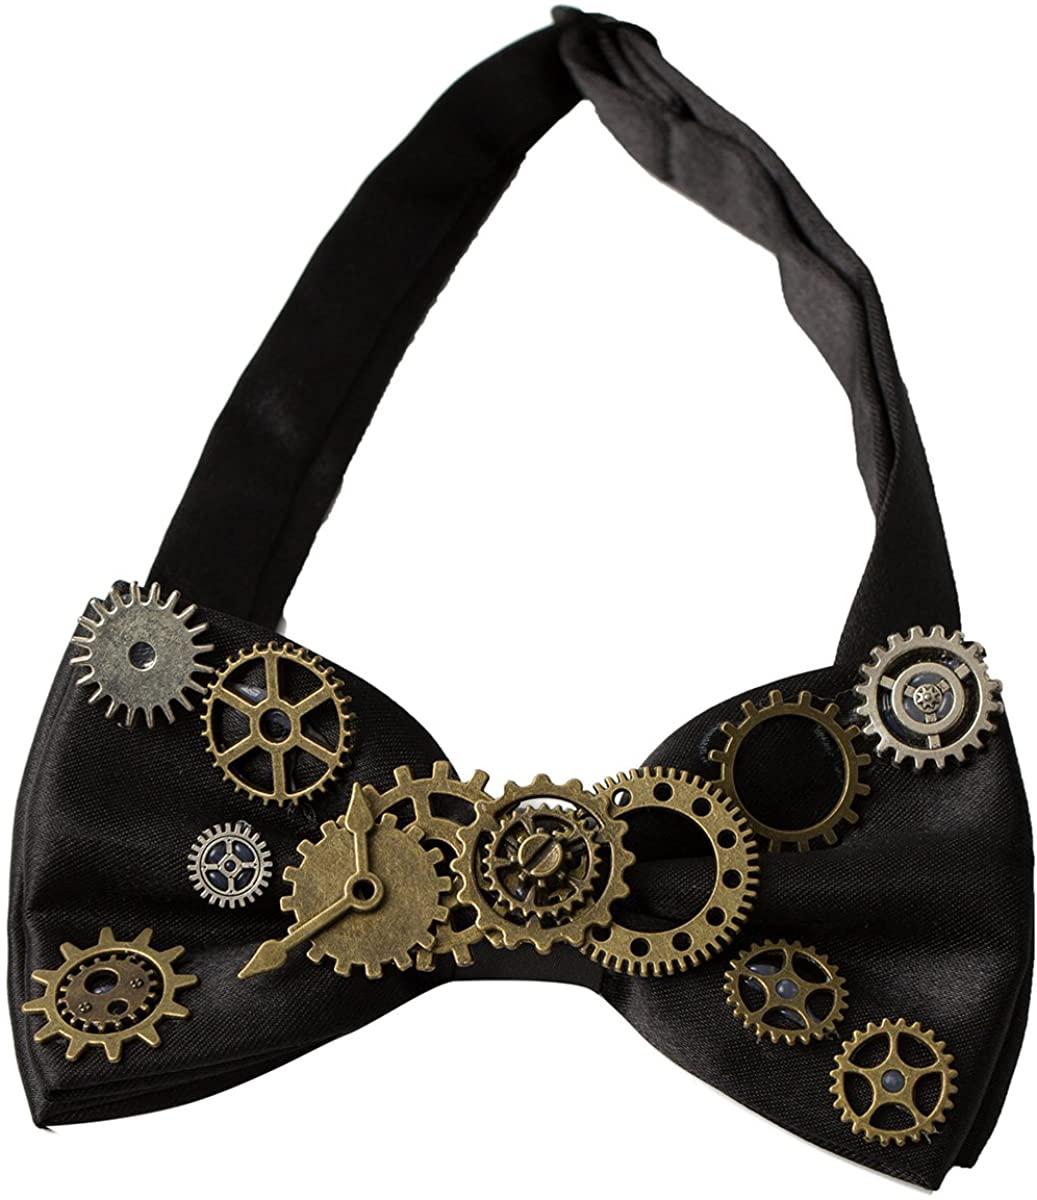 KOGOGO Steampunk Gears Bowtie Retro Costume Accessory